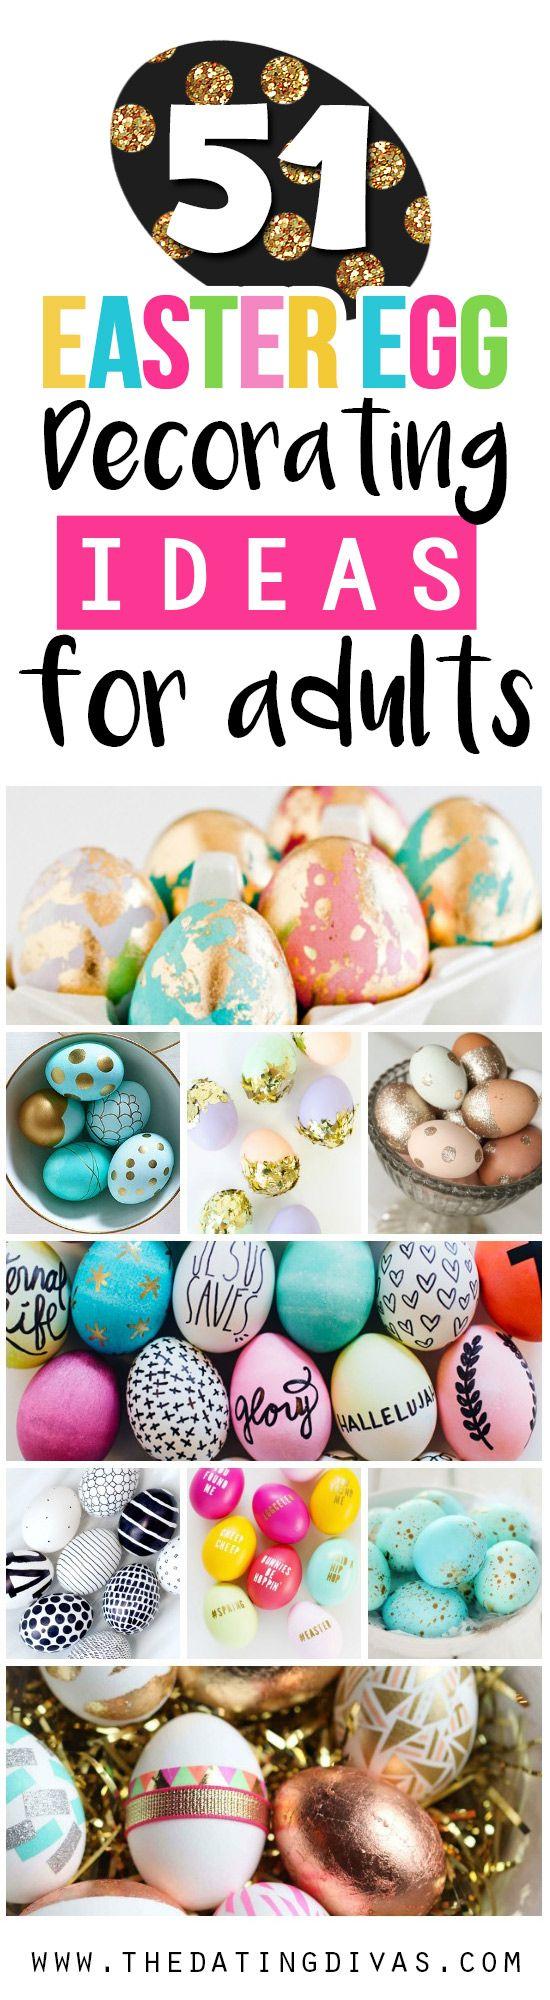 Easter crafts for seniors - 101 Easter Egg Decorating Ideas